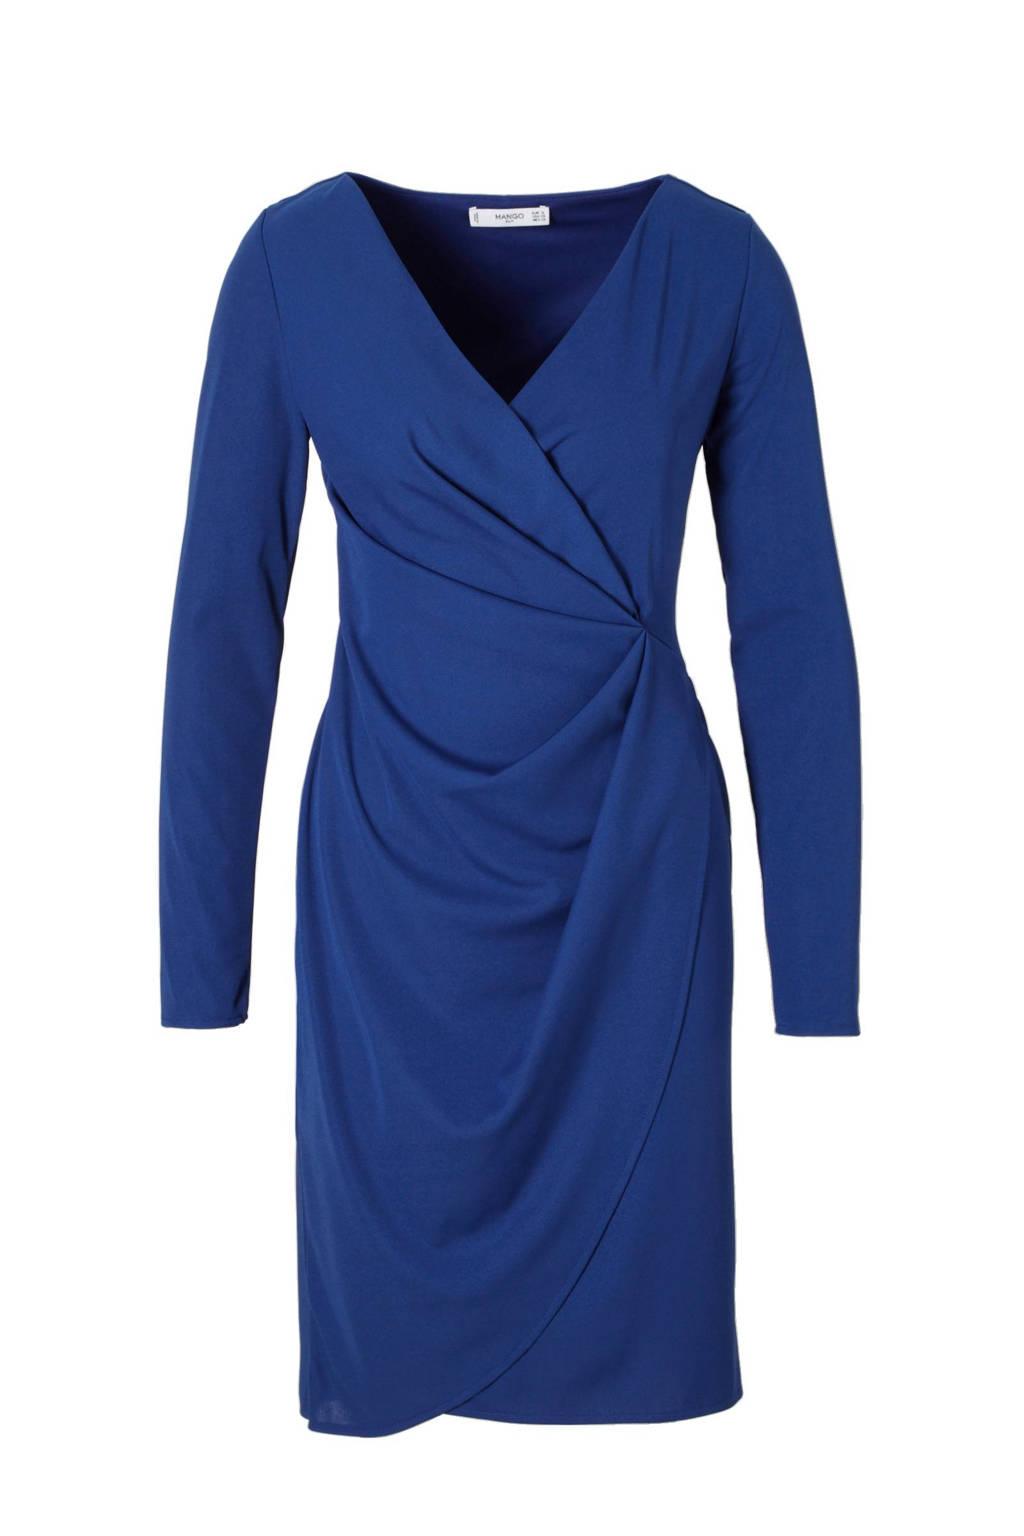 Mango jurk, Kobalt blauw